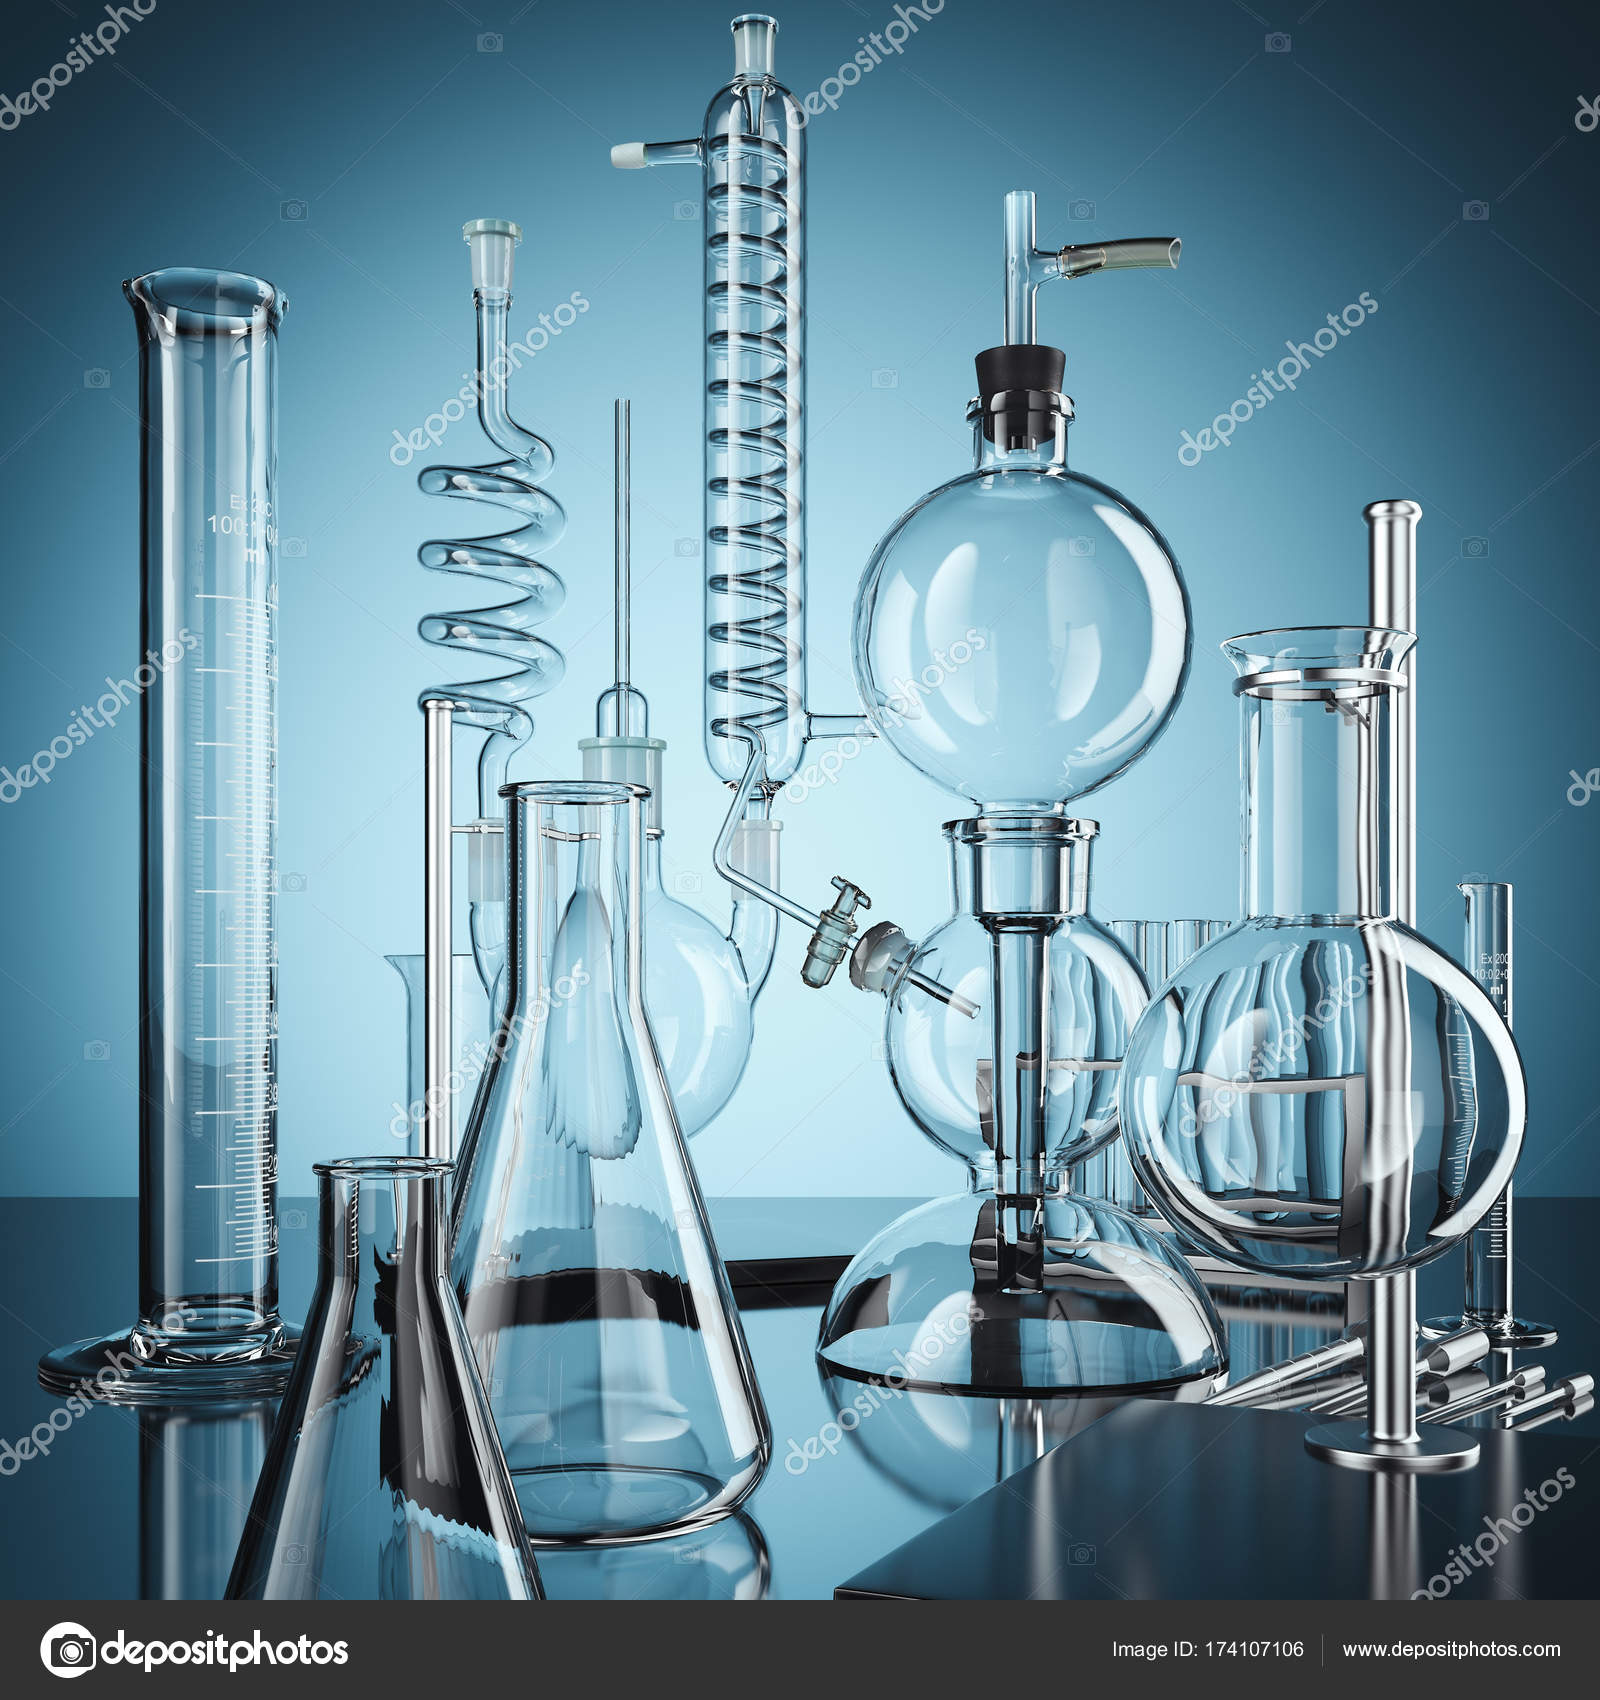 Glass Chemistry Lab Equipment 3d Rendering